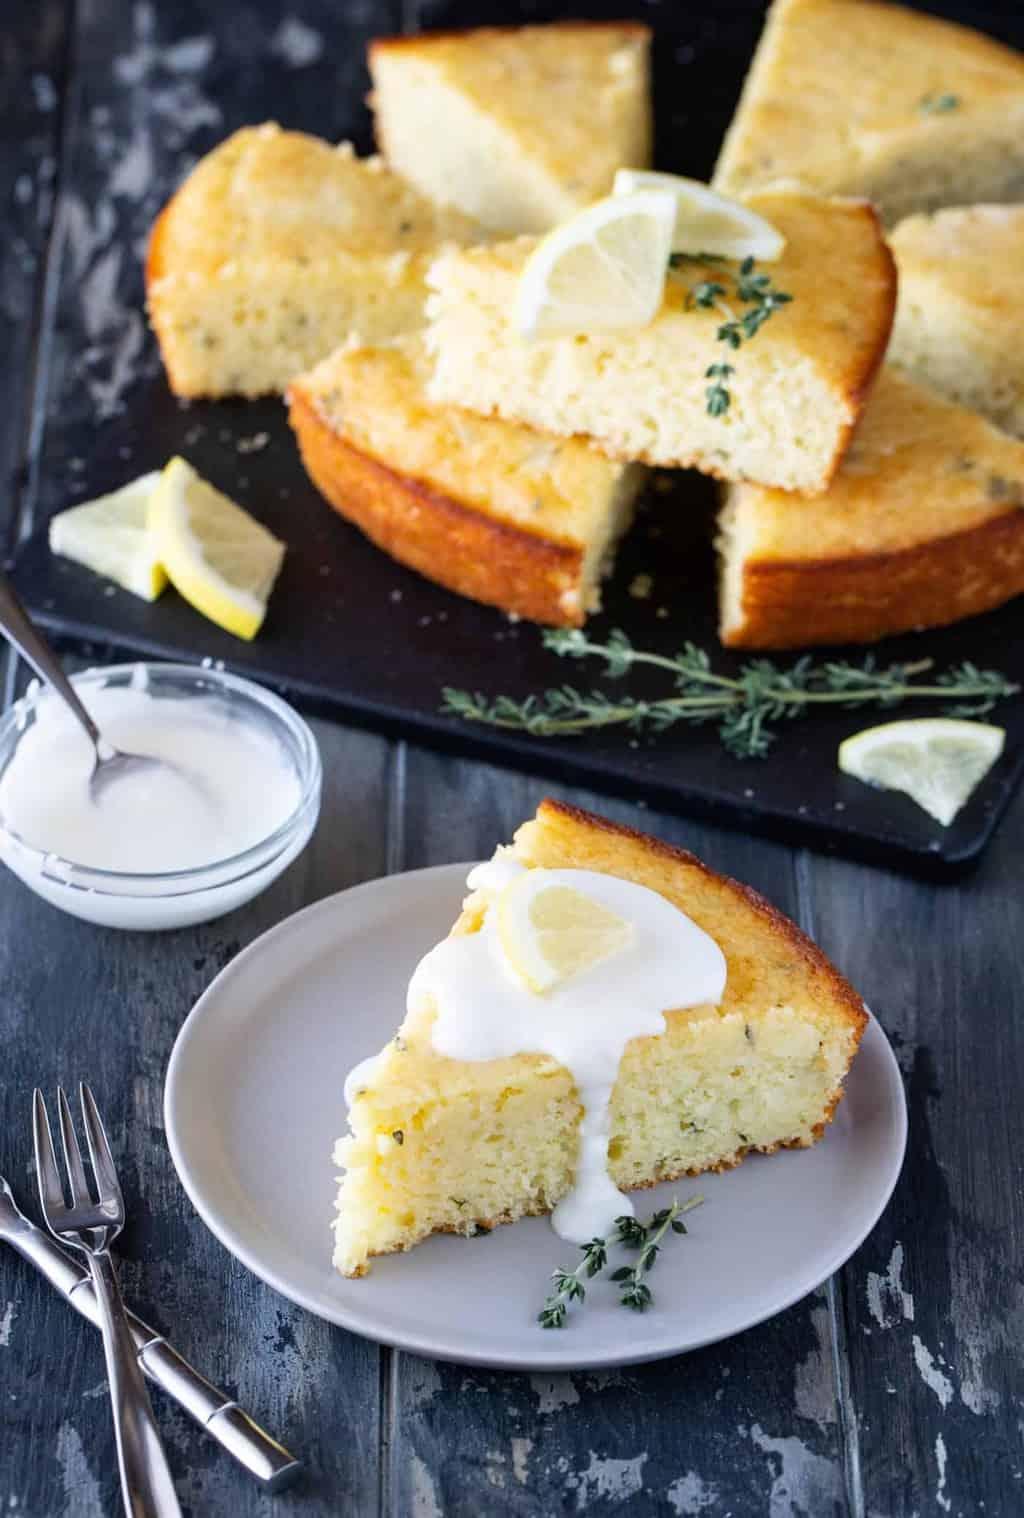 A slice of Lemon cake on a gray plate, garnished with a fresh lemon glaze, a lemon slice and fresh thyme leaves.